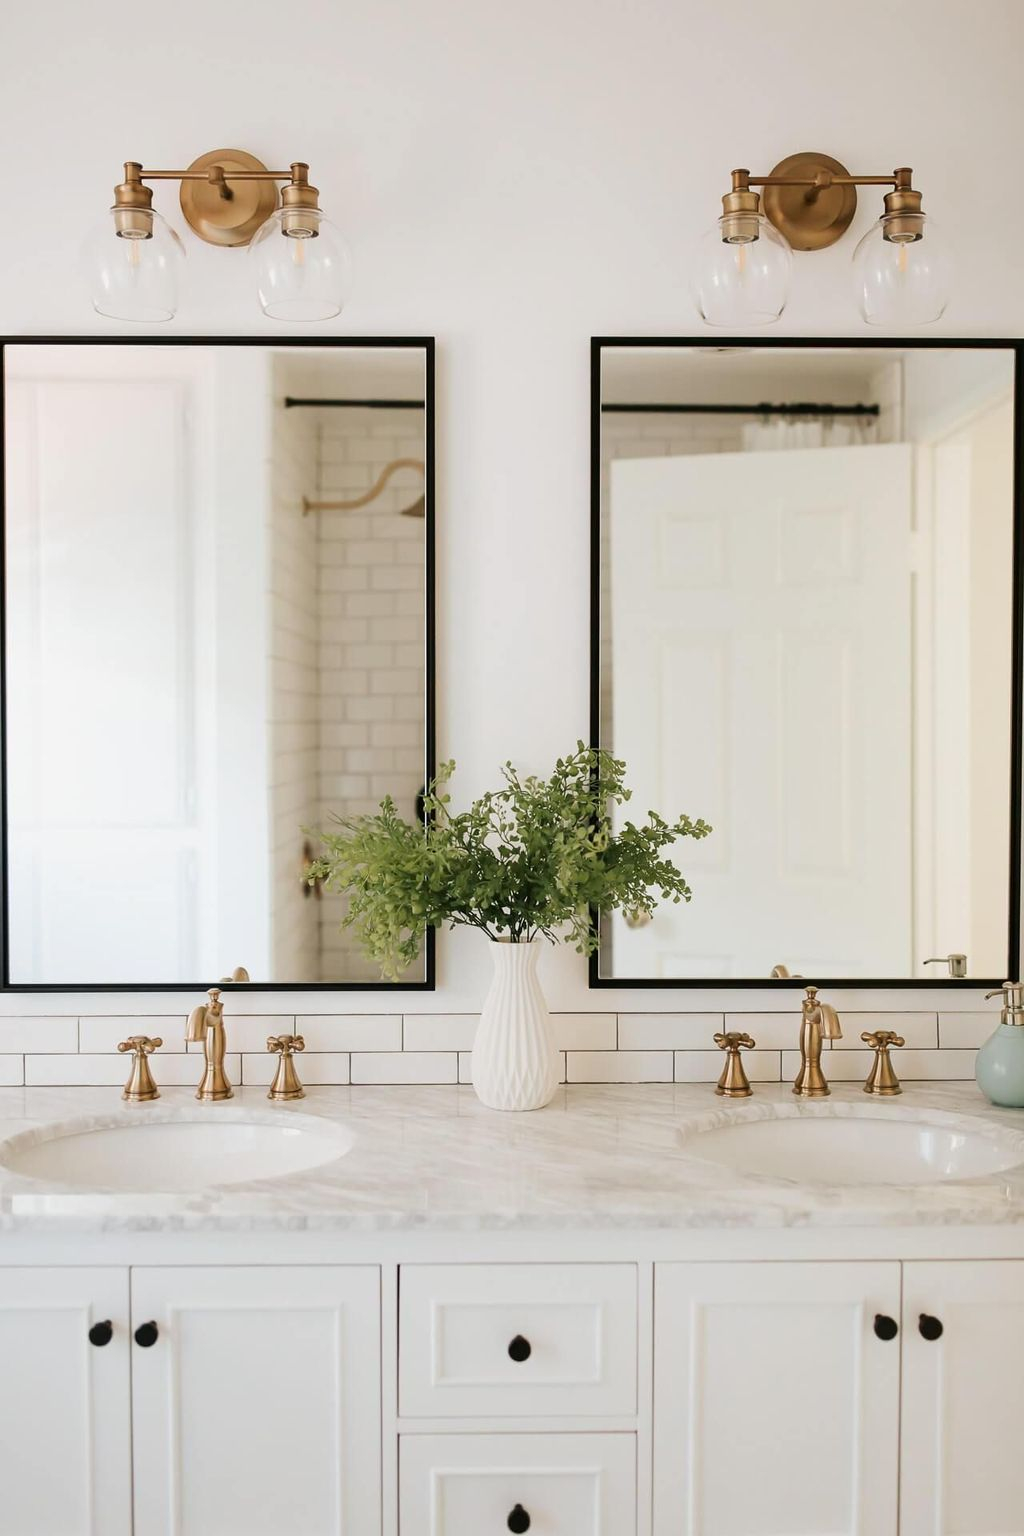 Unusual Bathroom Design Ideas You Need To Know 12